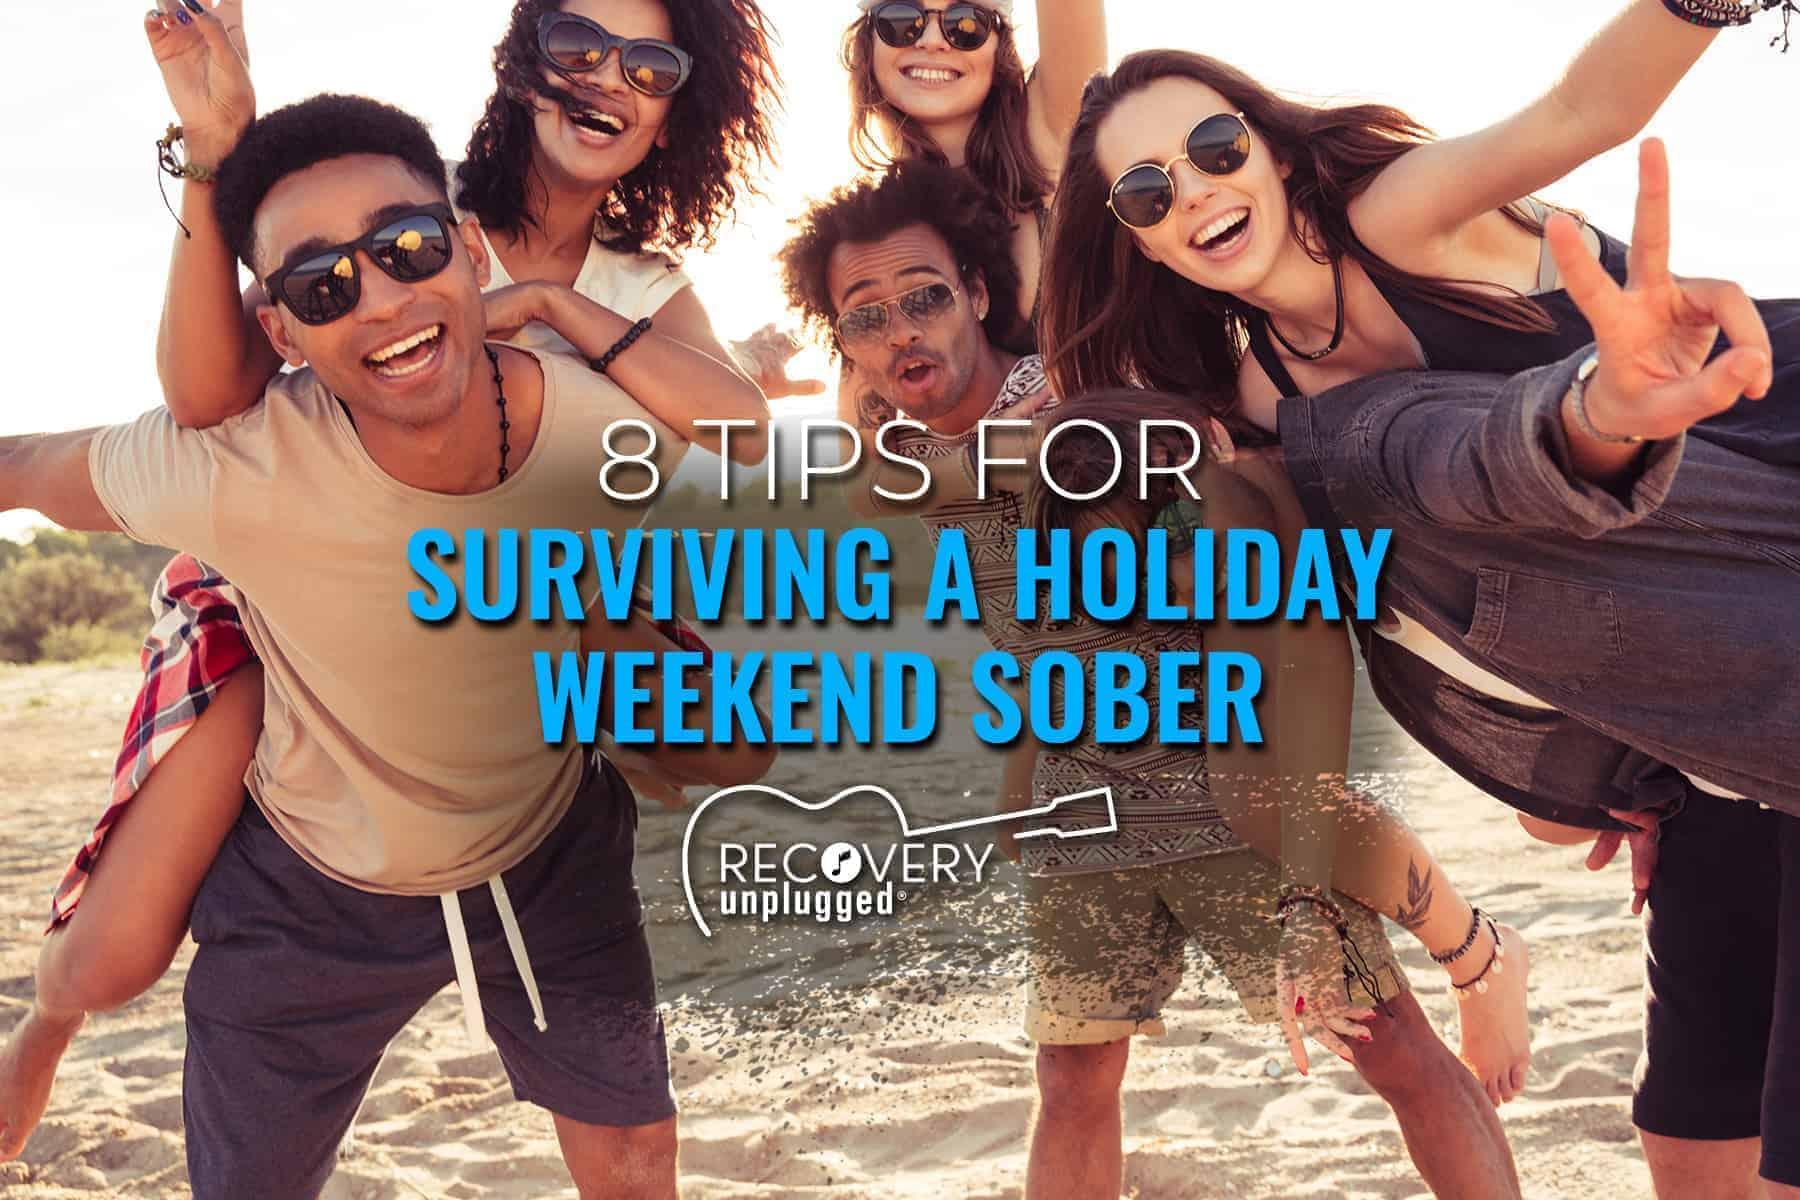 Sober Holiday Weekend